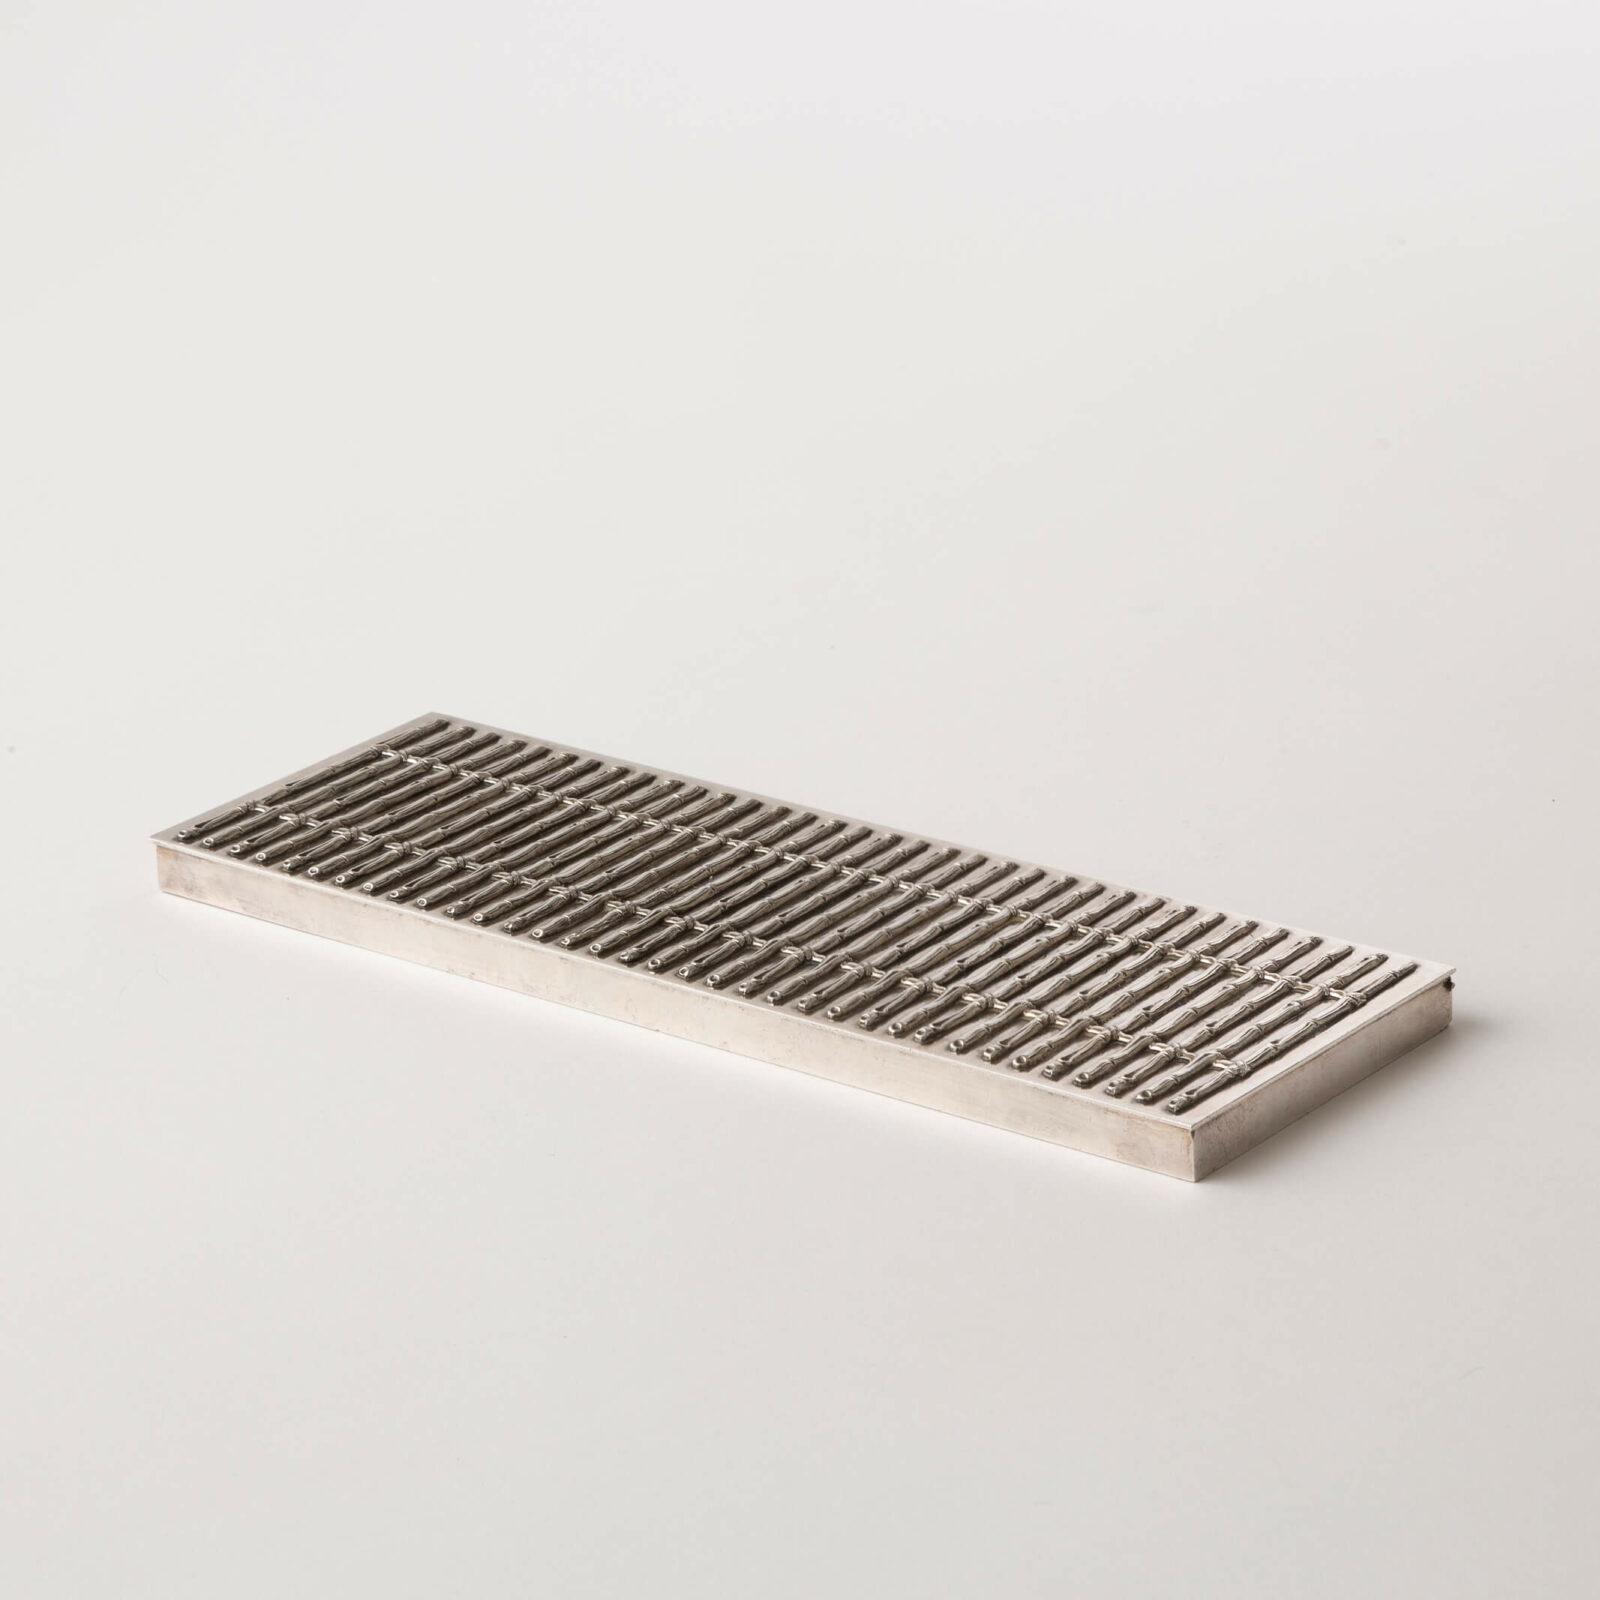 Bamboo (cigarettes box)